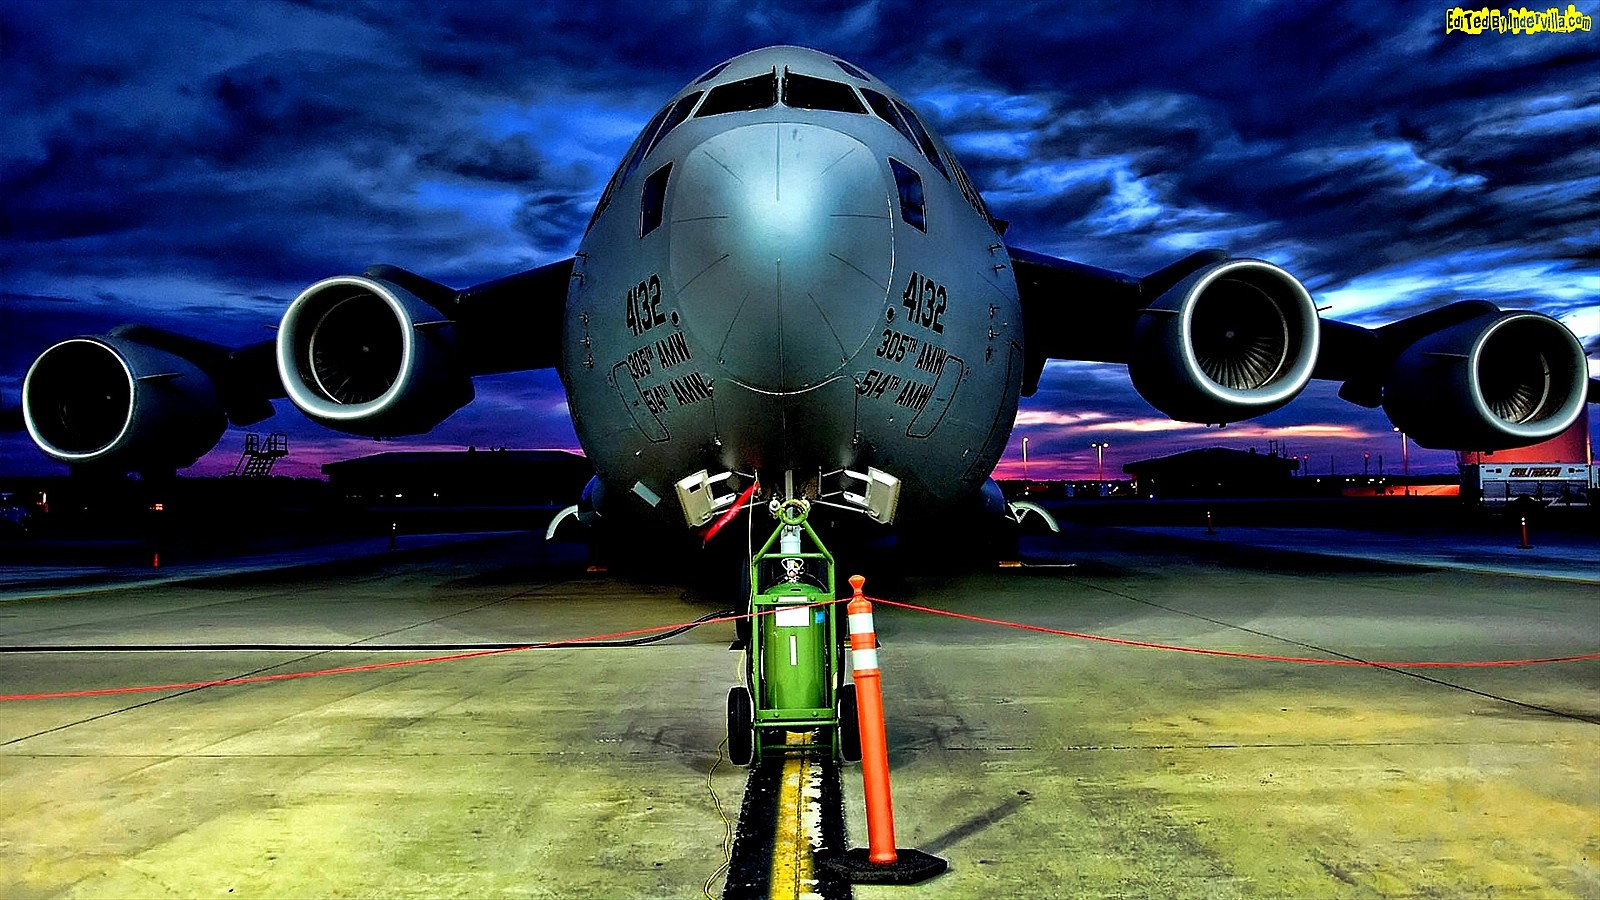 hd santas night flight wallpaper Car Pictures 1600x900